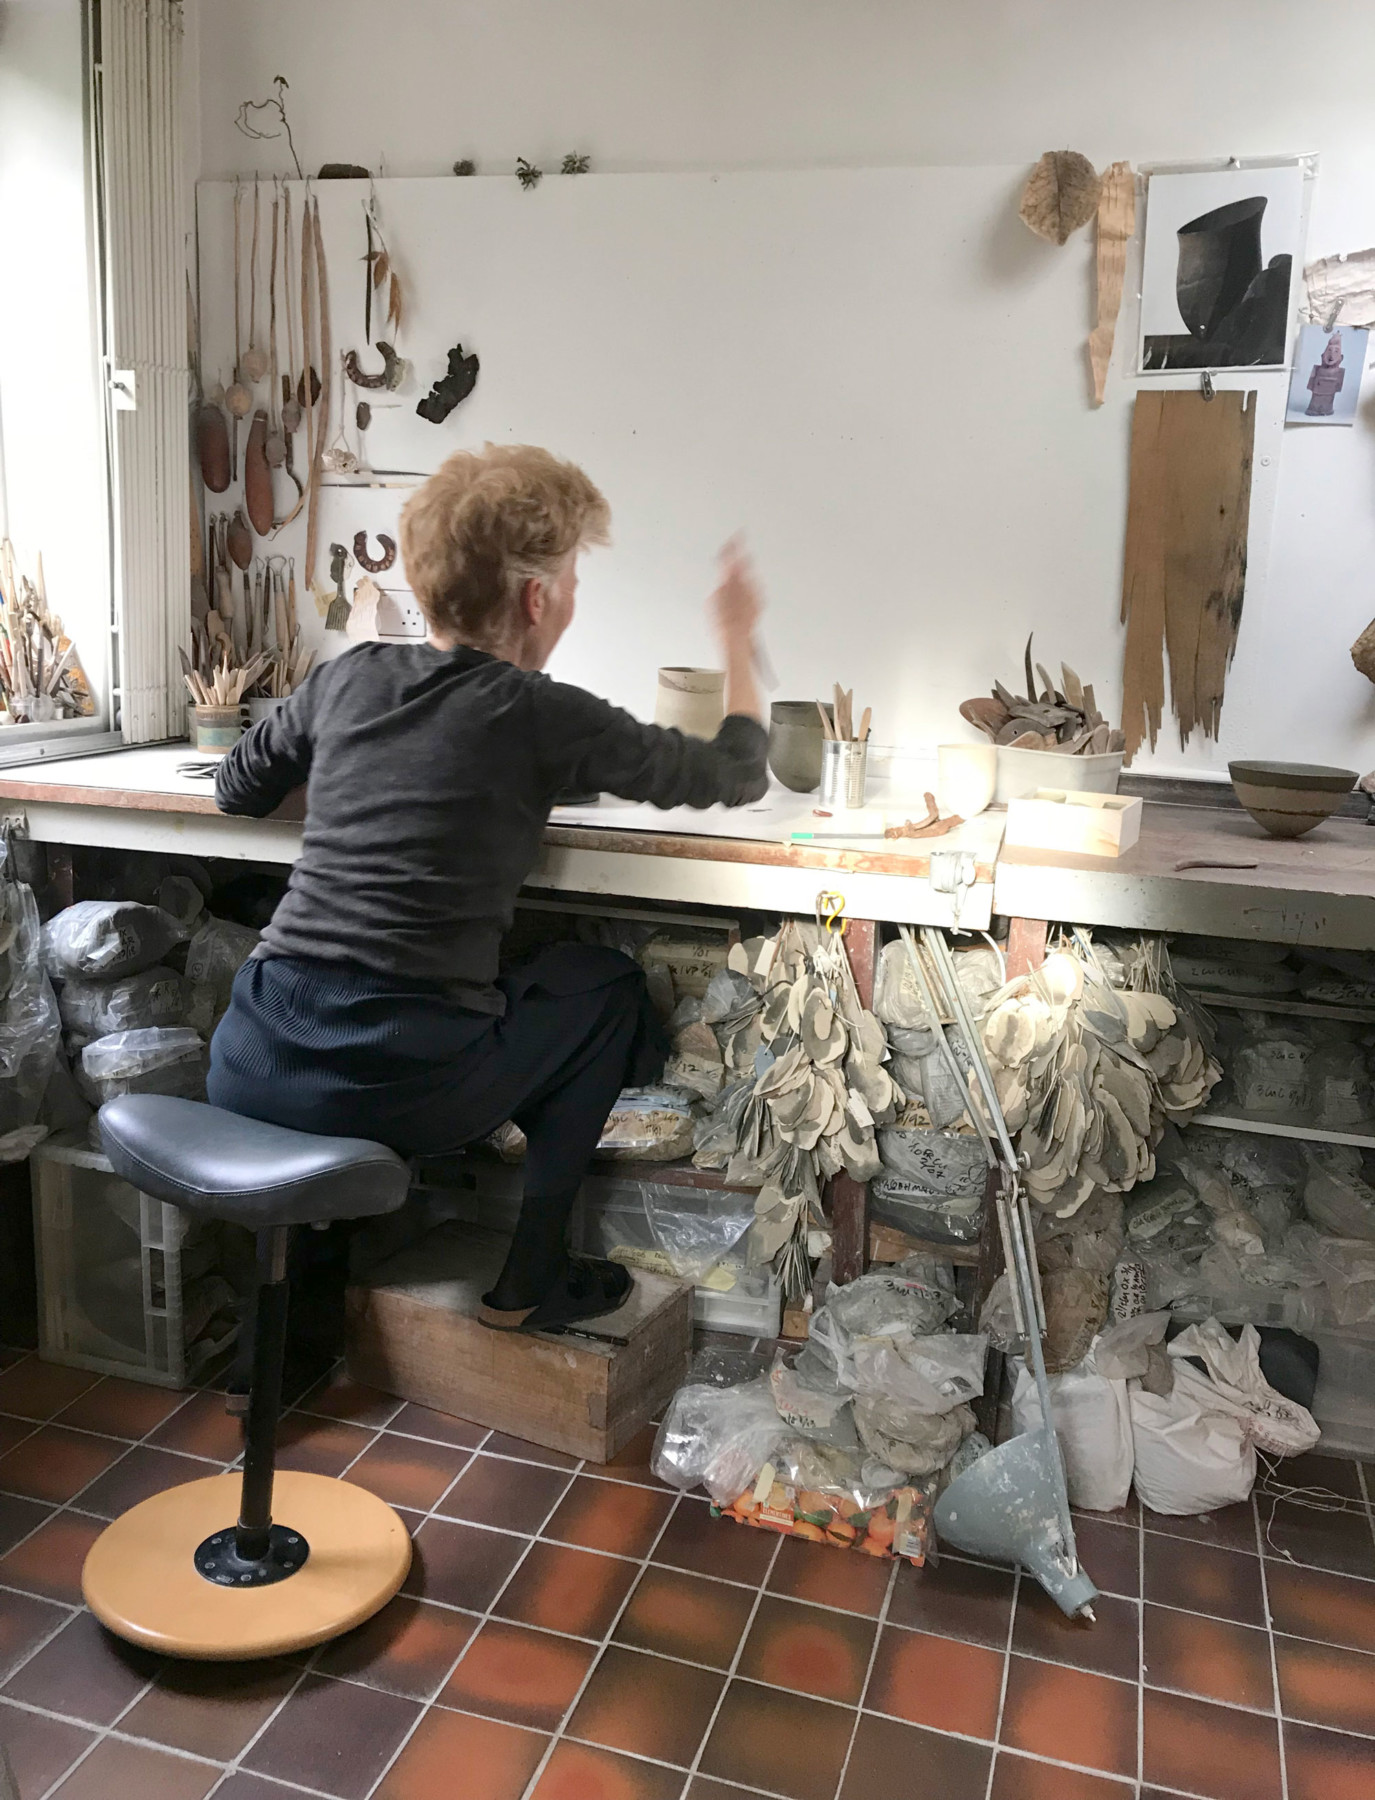 kettles-yard-exhibition-design-jamie-fobert-architects-studio-visit-jeff-process